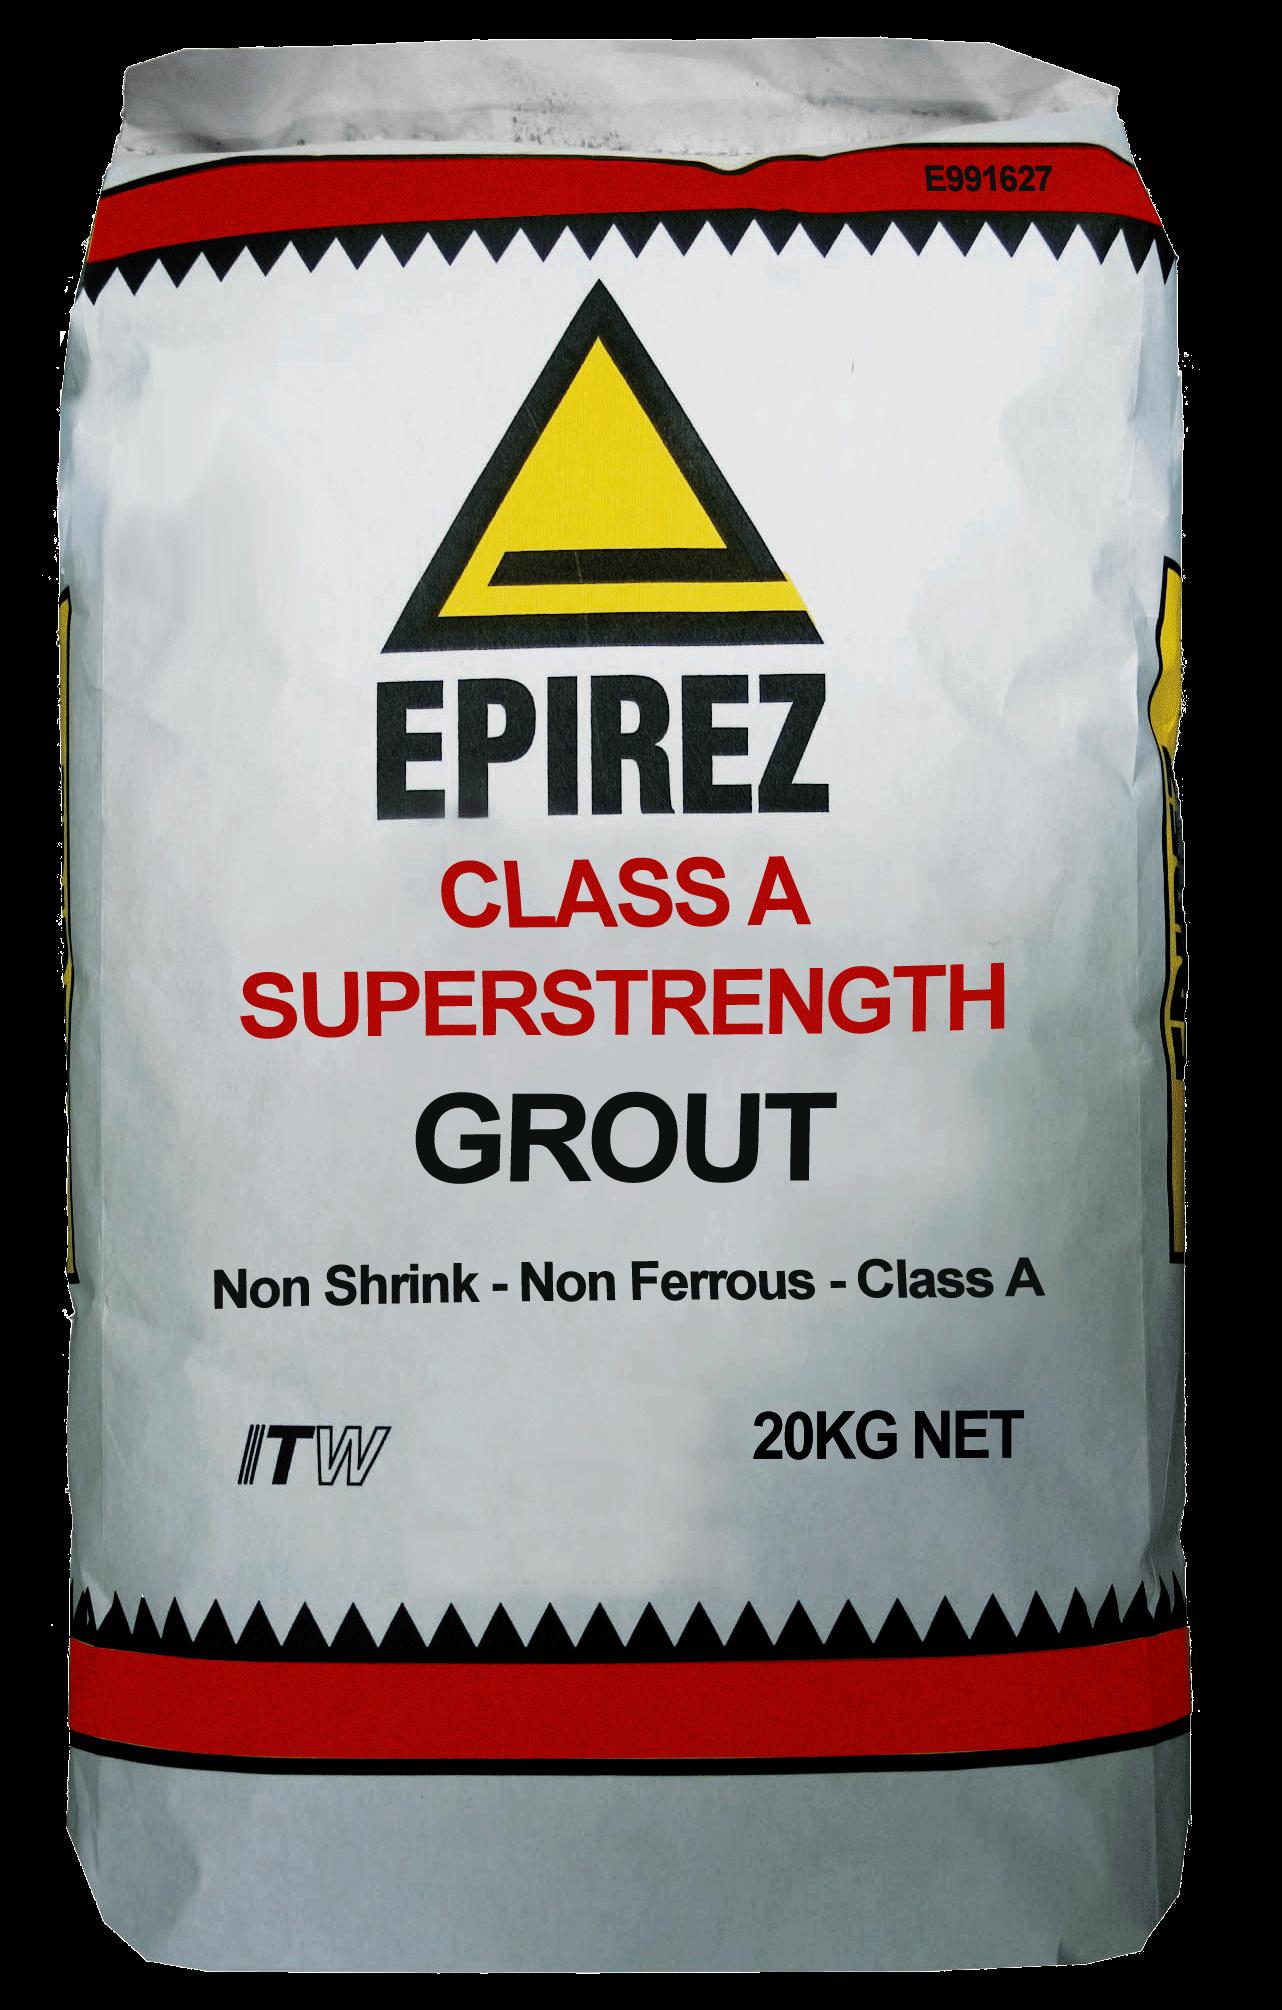 Class A Superstrength Grout